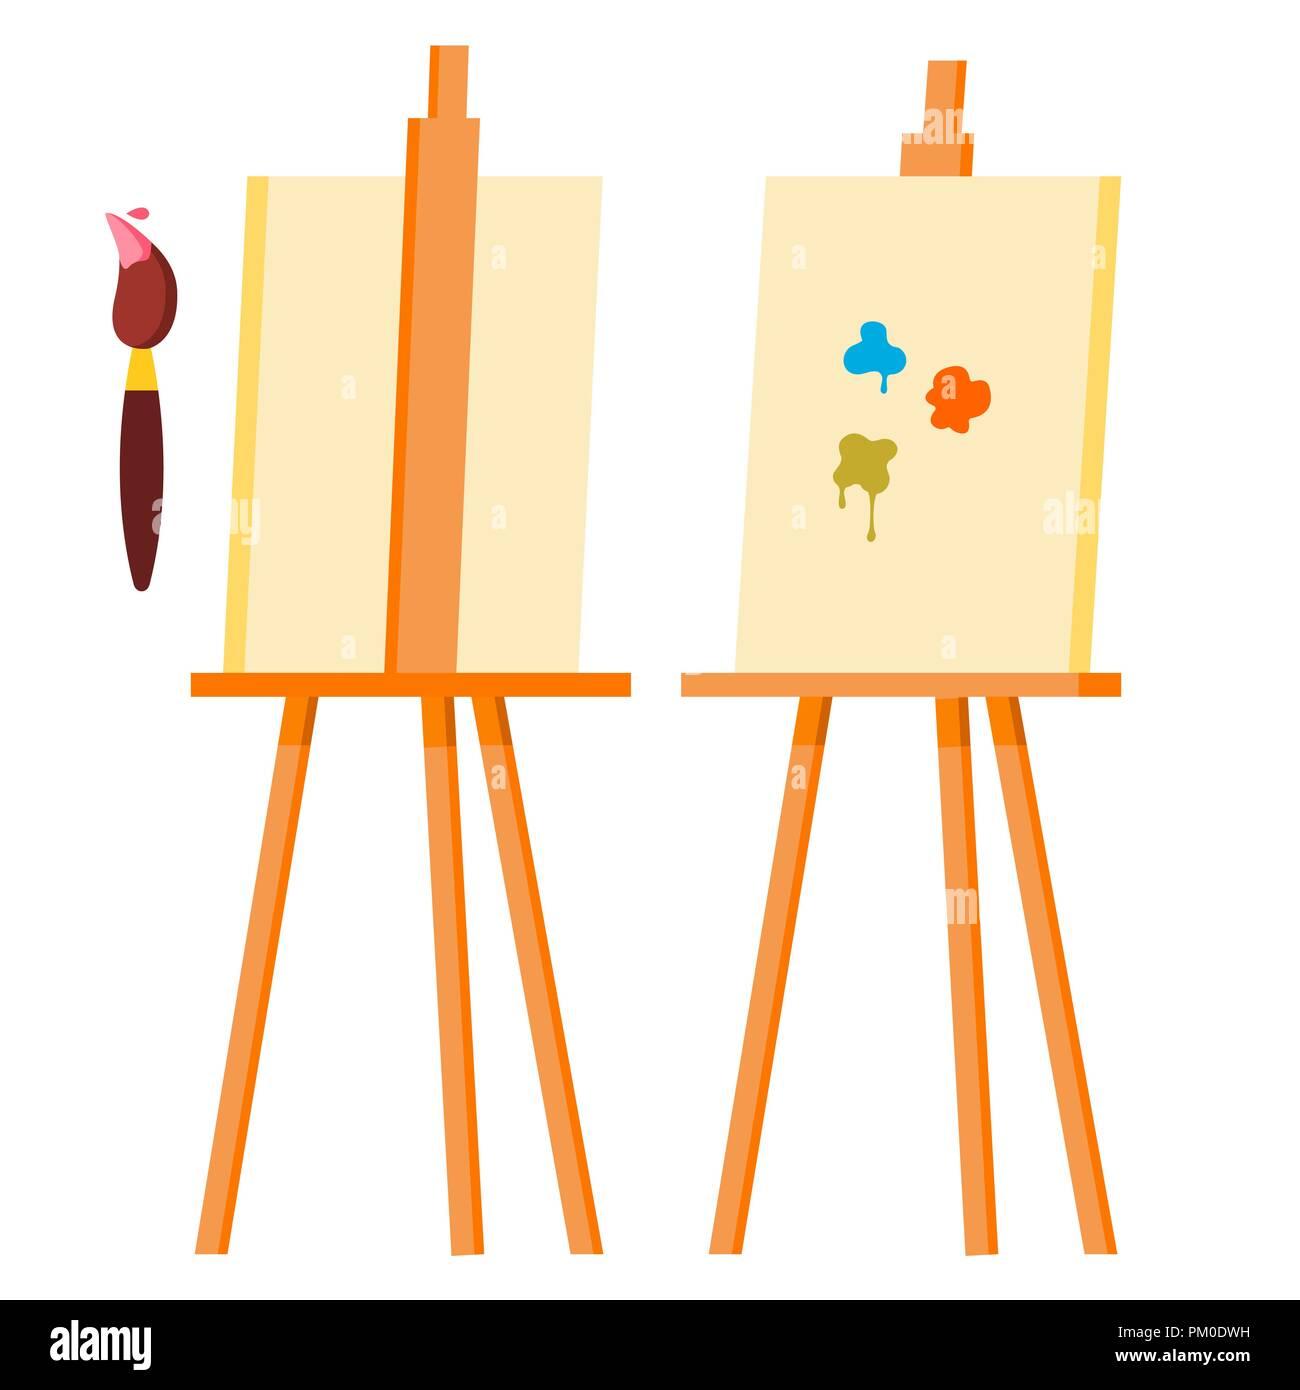 Painting Brush Palette Easel Stock Photos & Painting Brush Palette ...